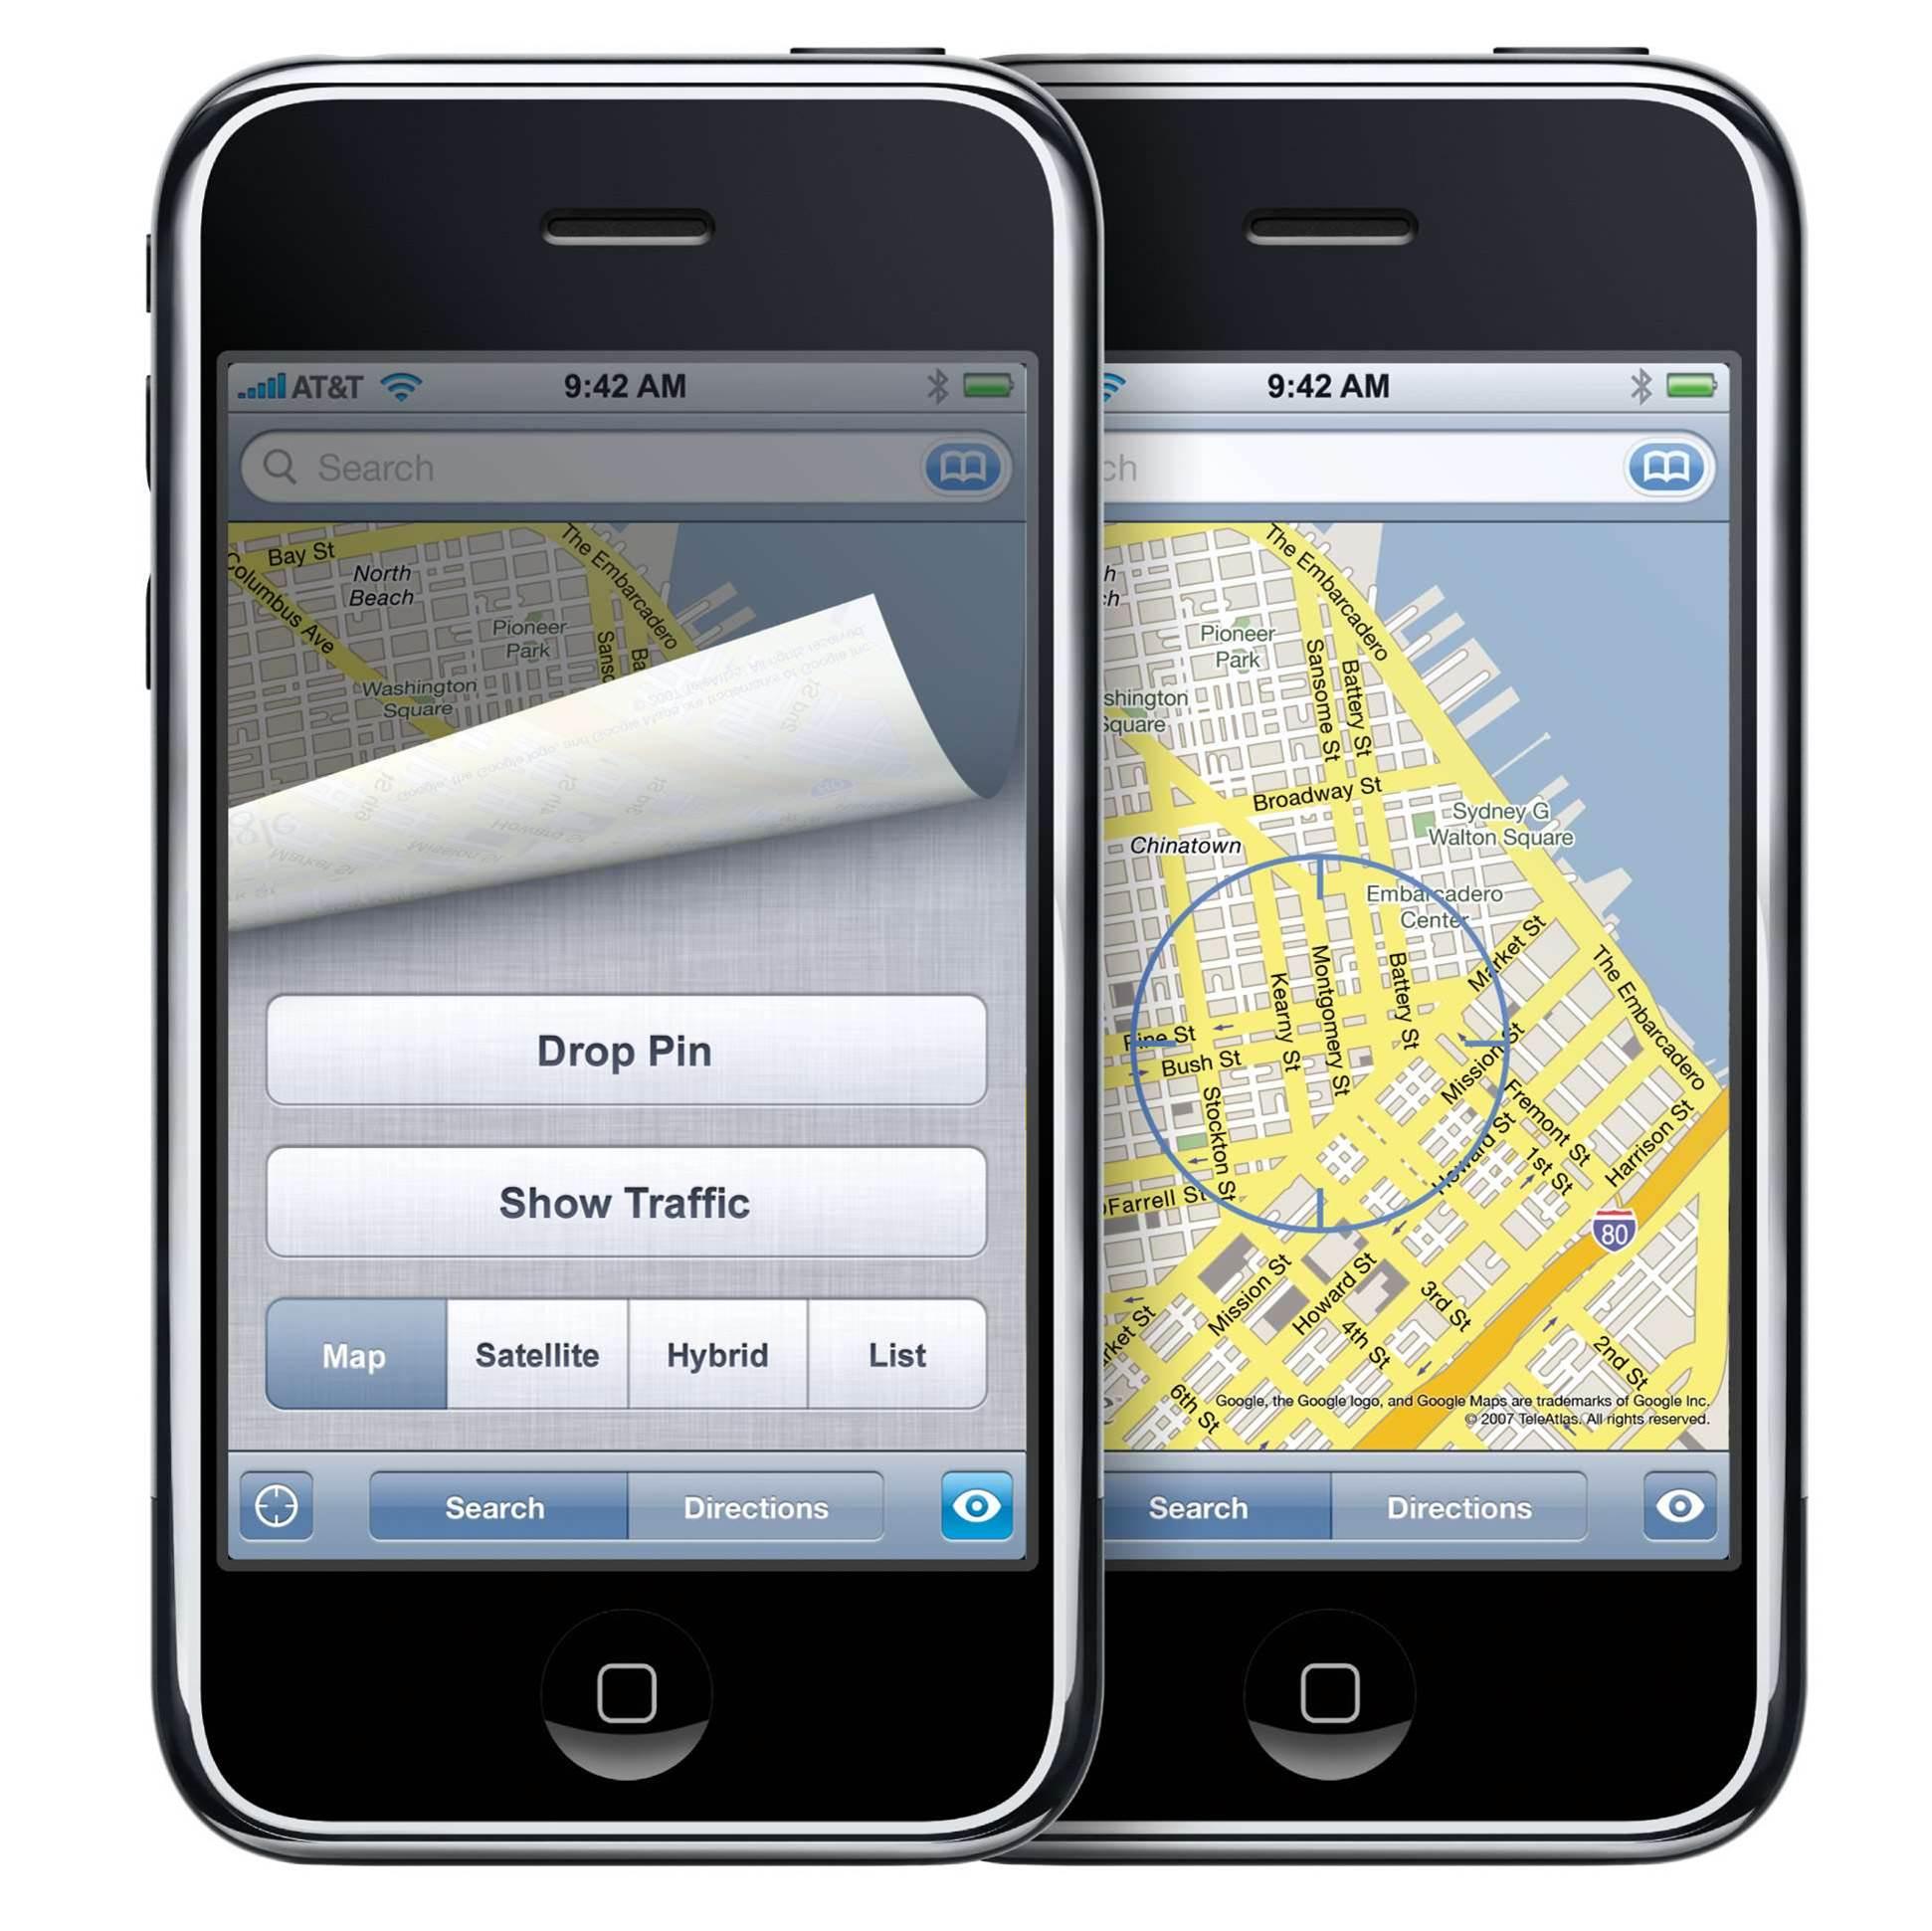 Townsville NBN designer surveys sites with iPhone app